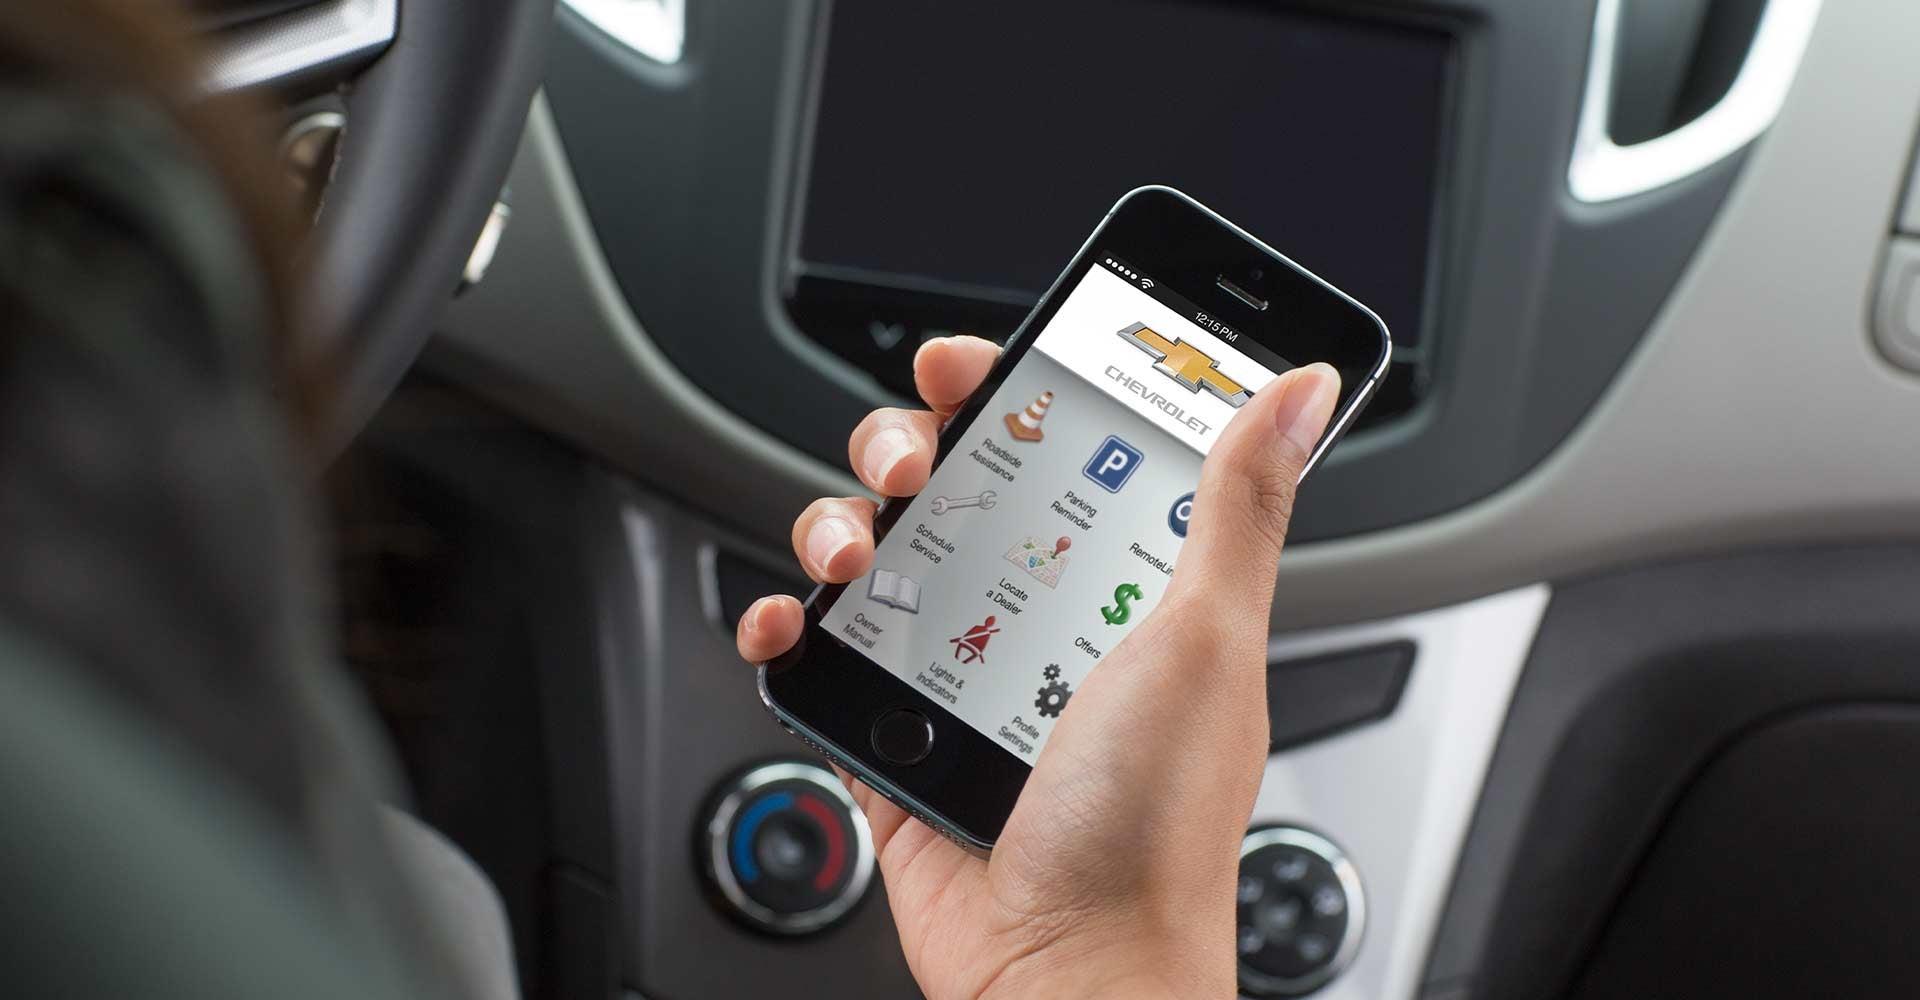 Discover Mychevrolet App Benefits Preston Chevrolet Of Aberdeen